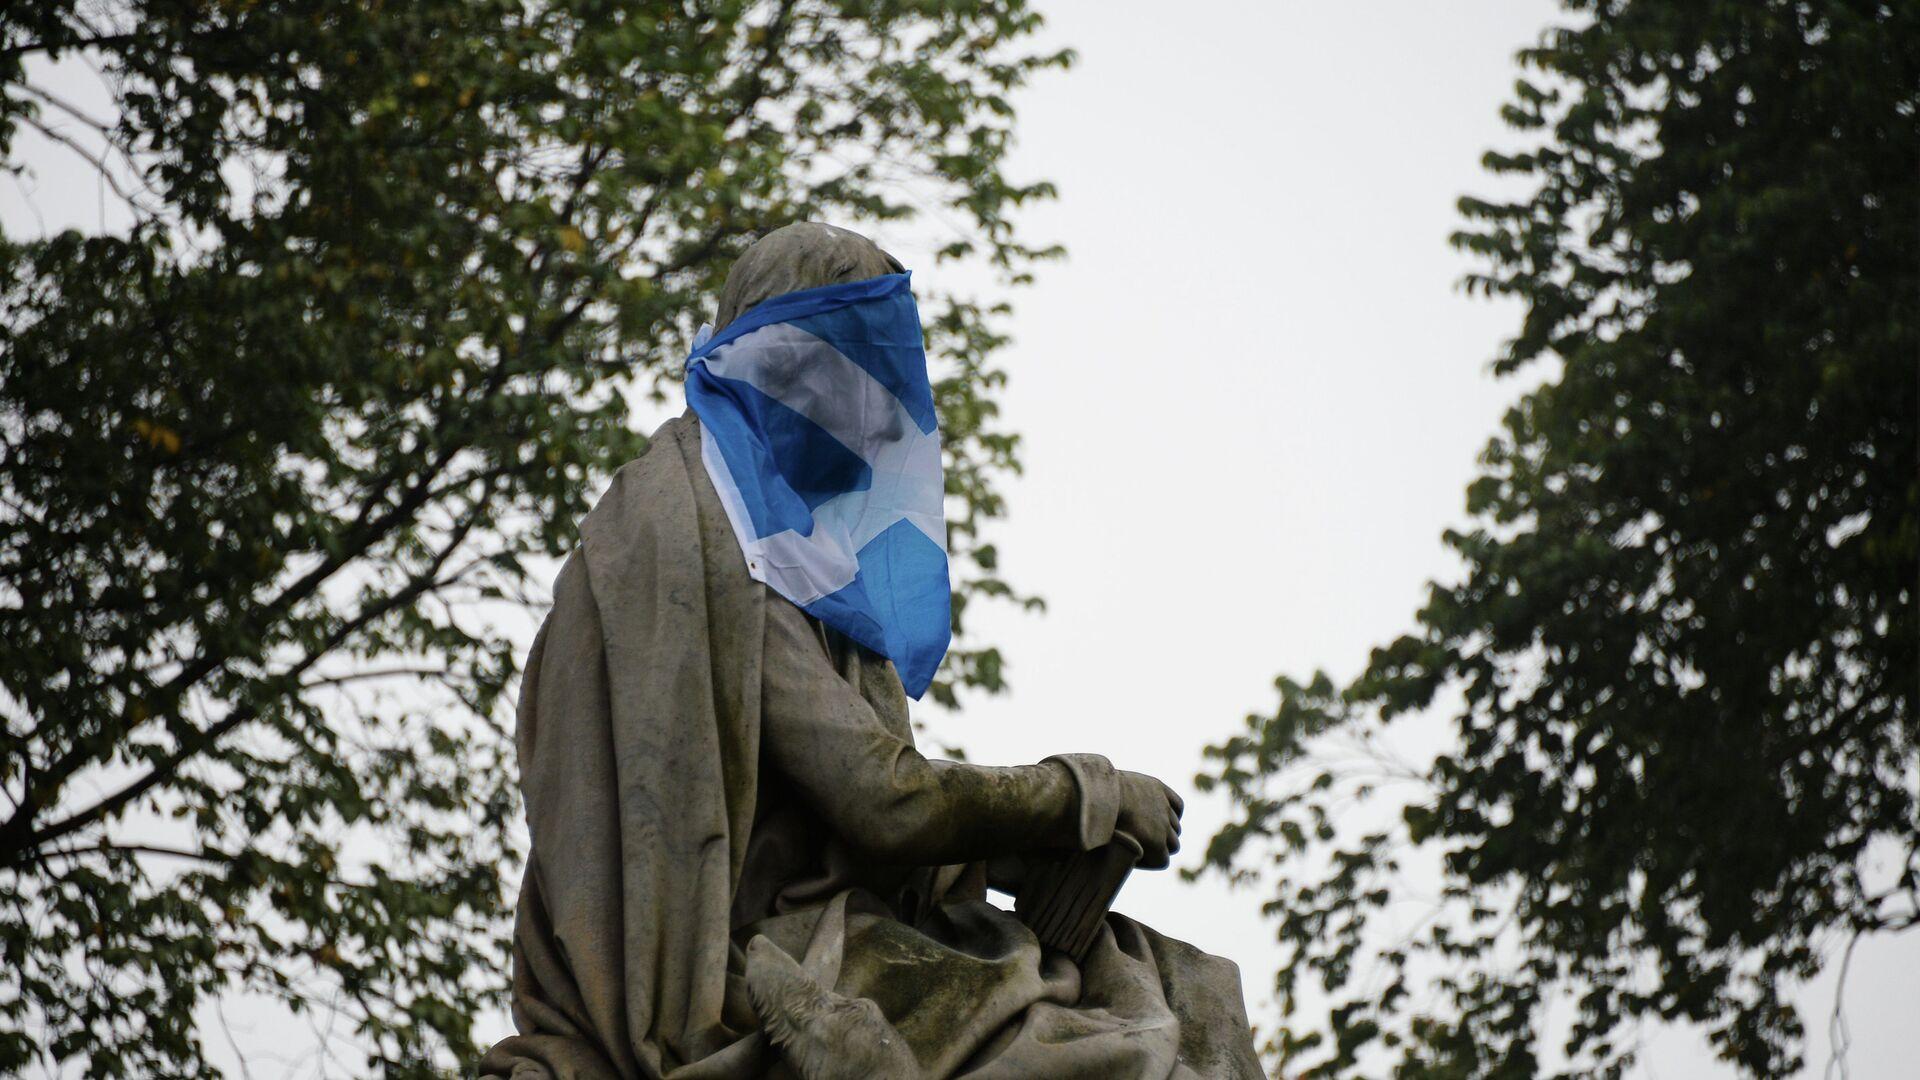 Референдум о независимости Шотландии - РИА Новости, 1920, 09.05.2021